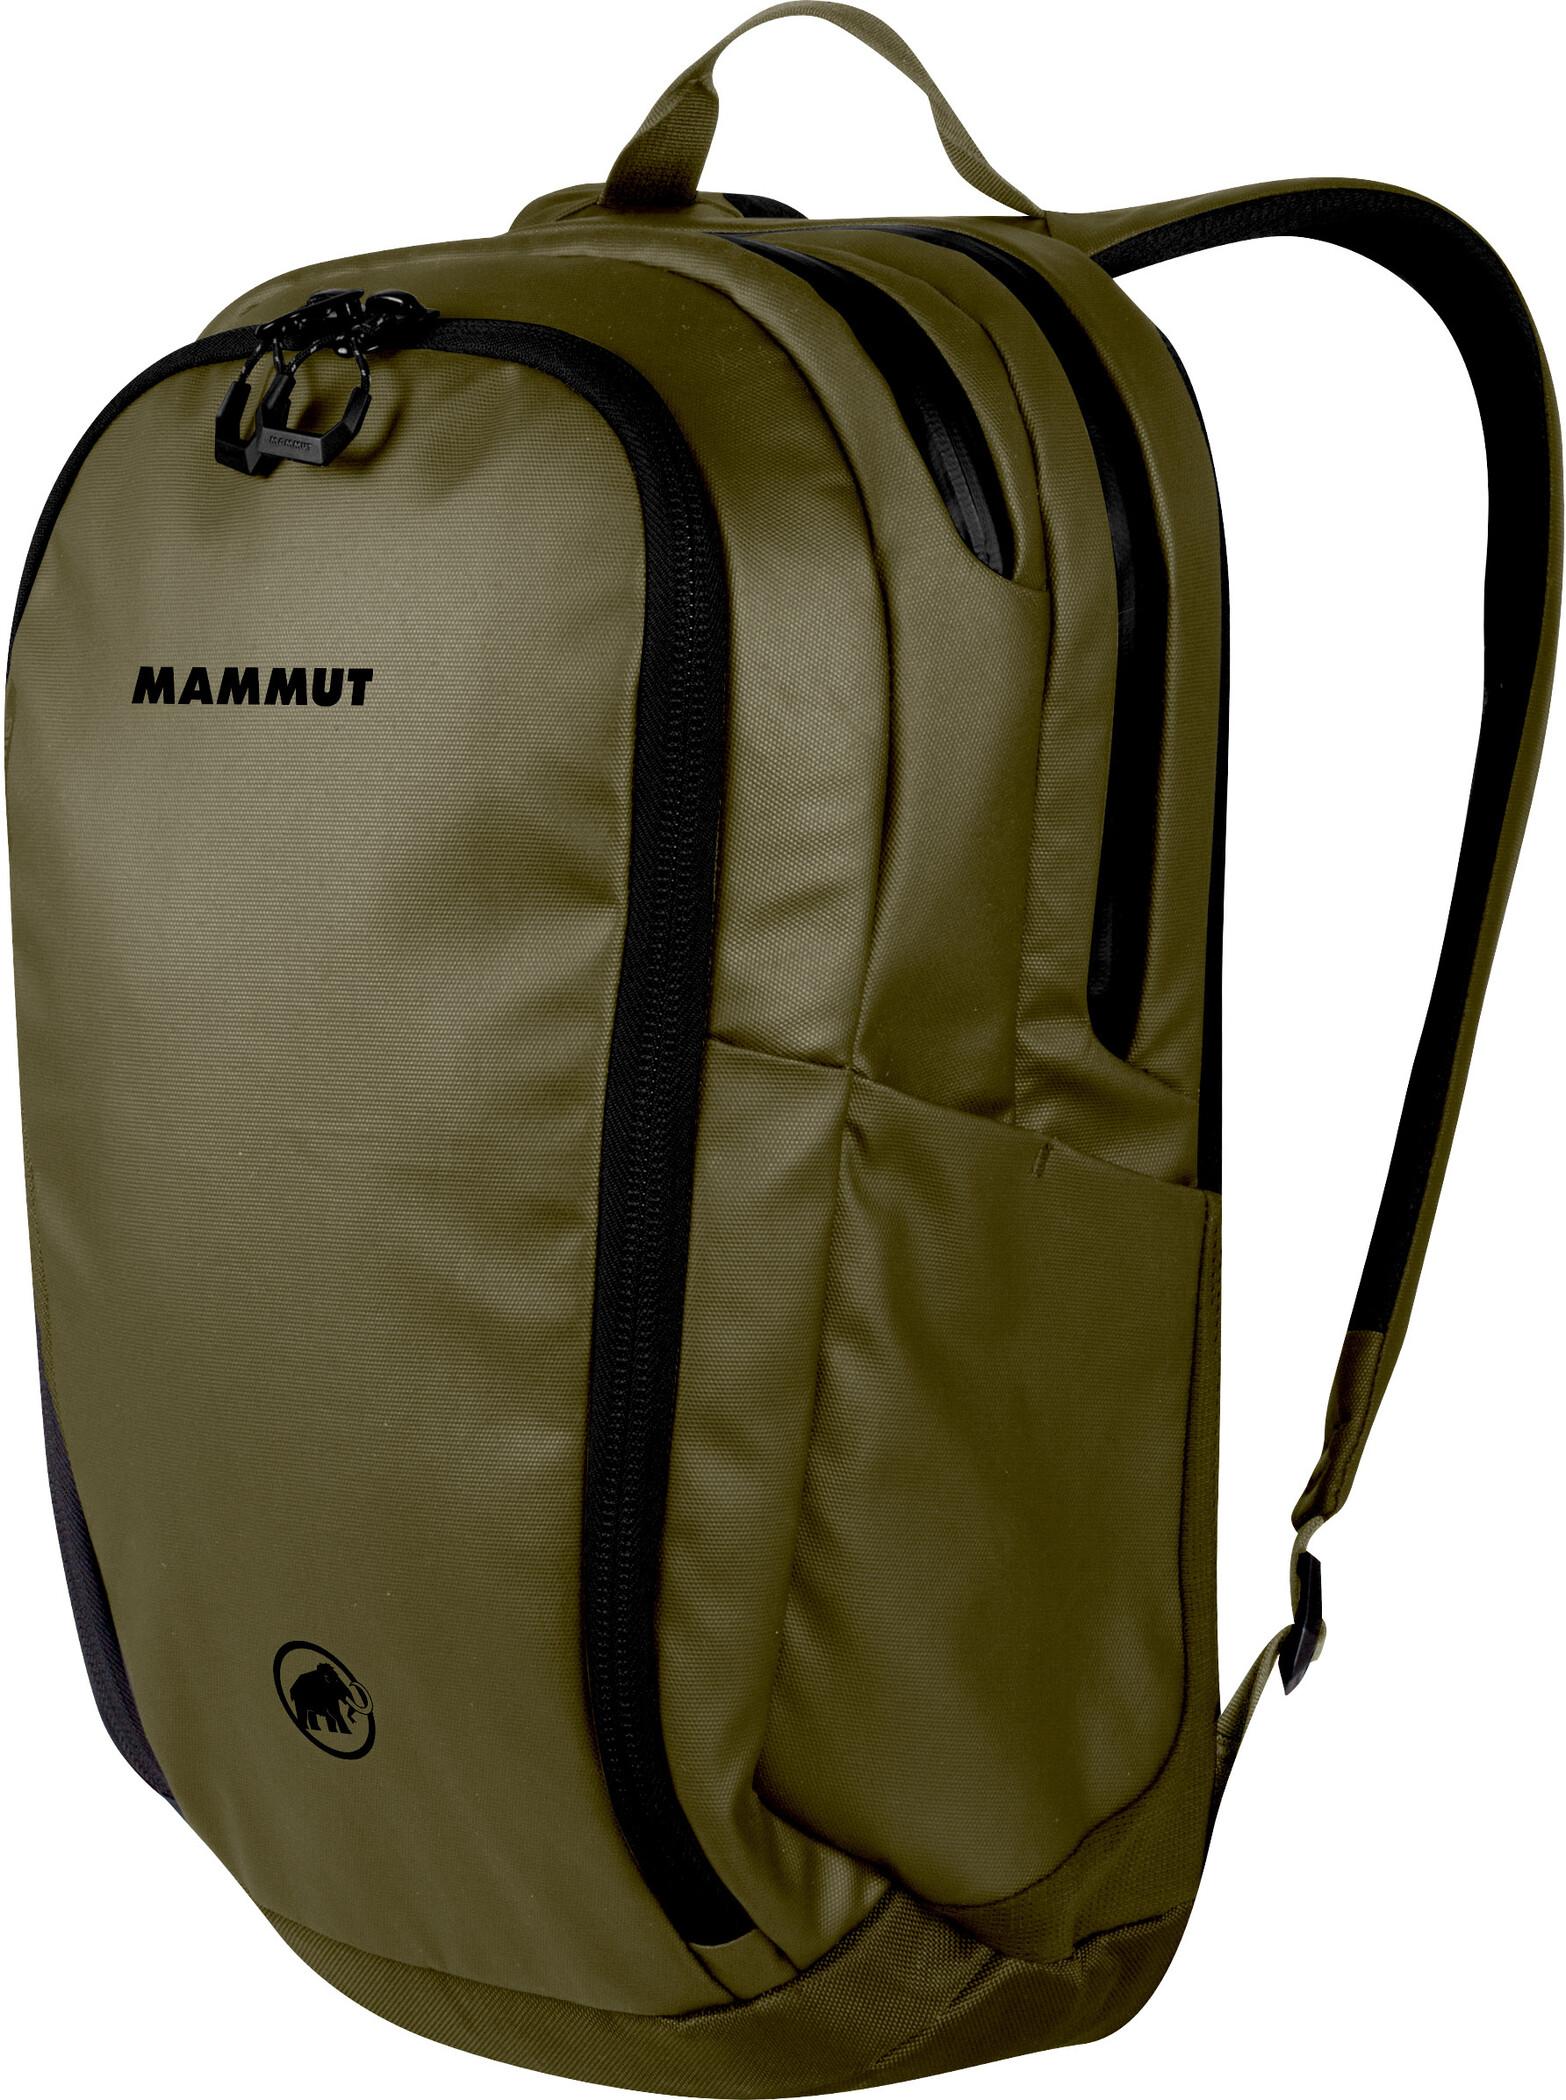 Mammut Seon Shuttle Rygsæk 22L, olive (2019) | Travel bags